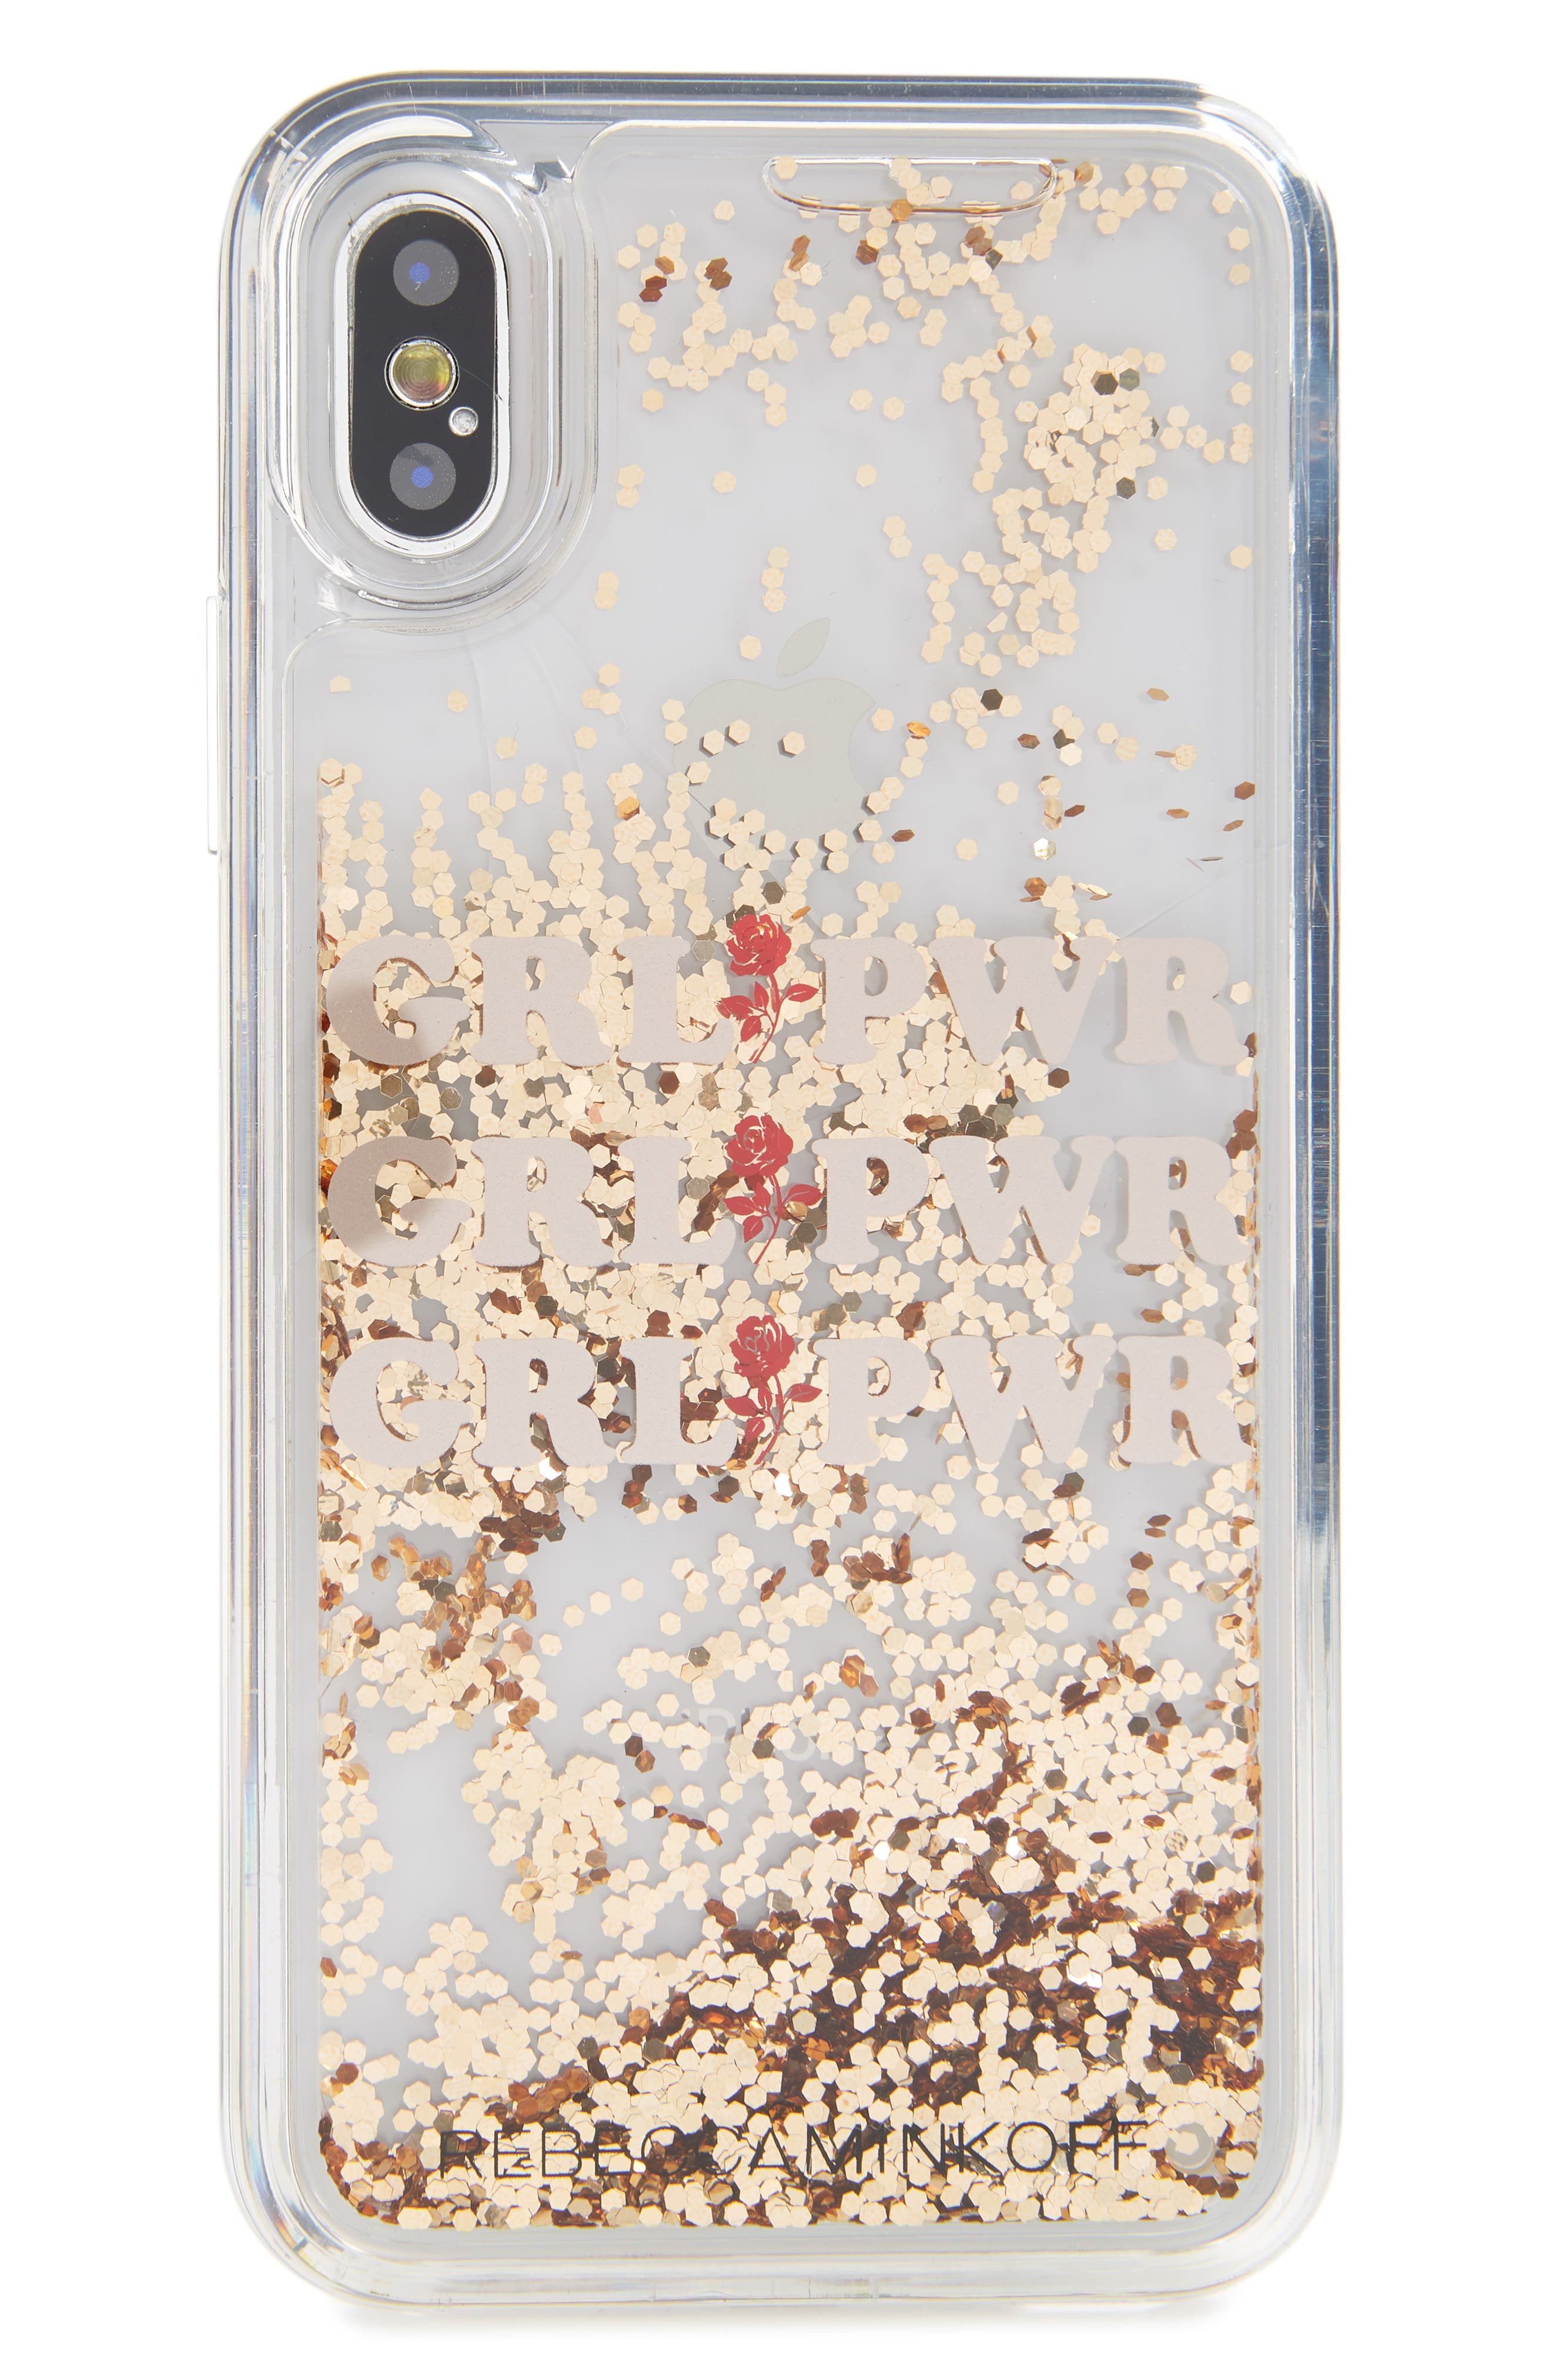 REBECCA MINKOFF Grl Pwr Glitterfall iPhone X/Xs Case, Main, color, 650